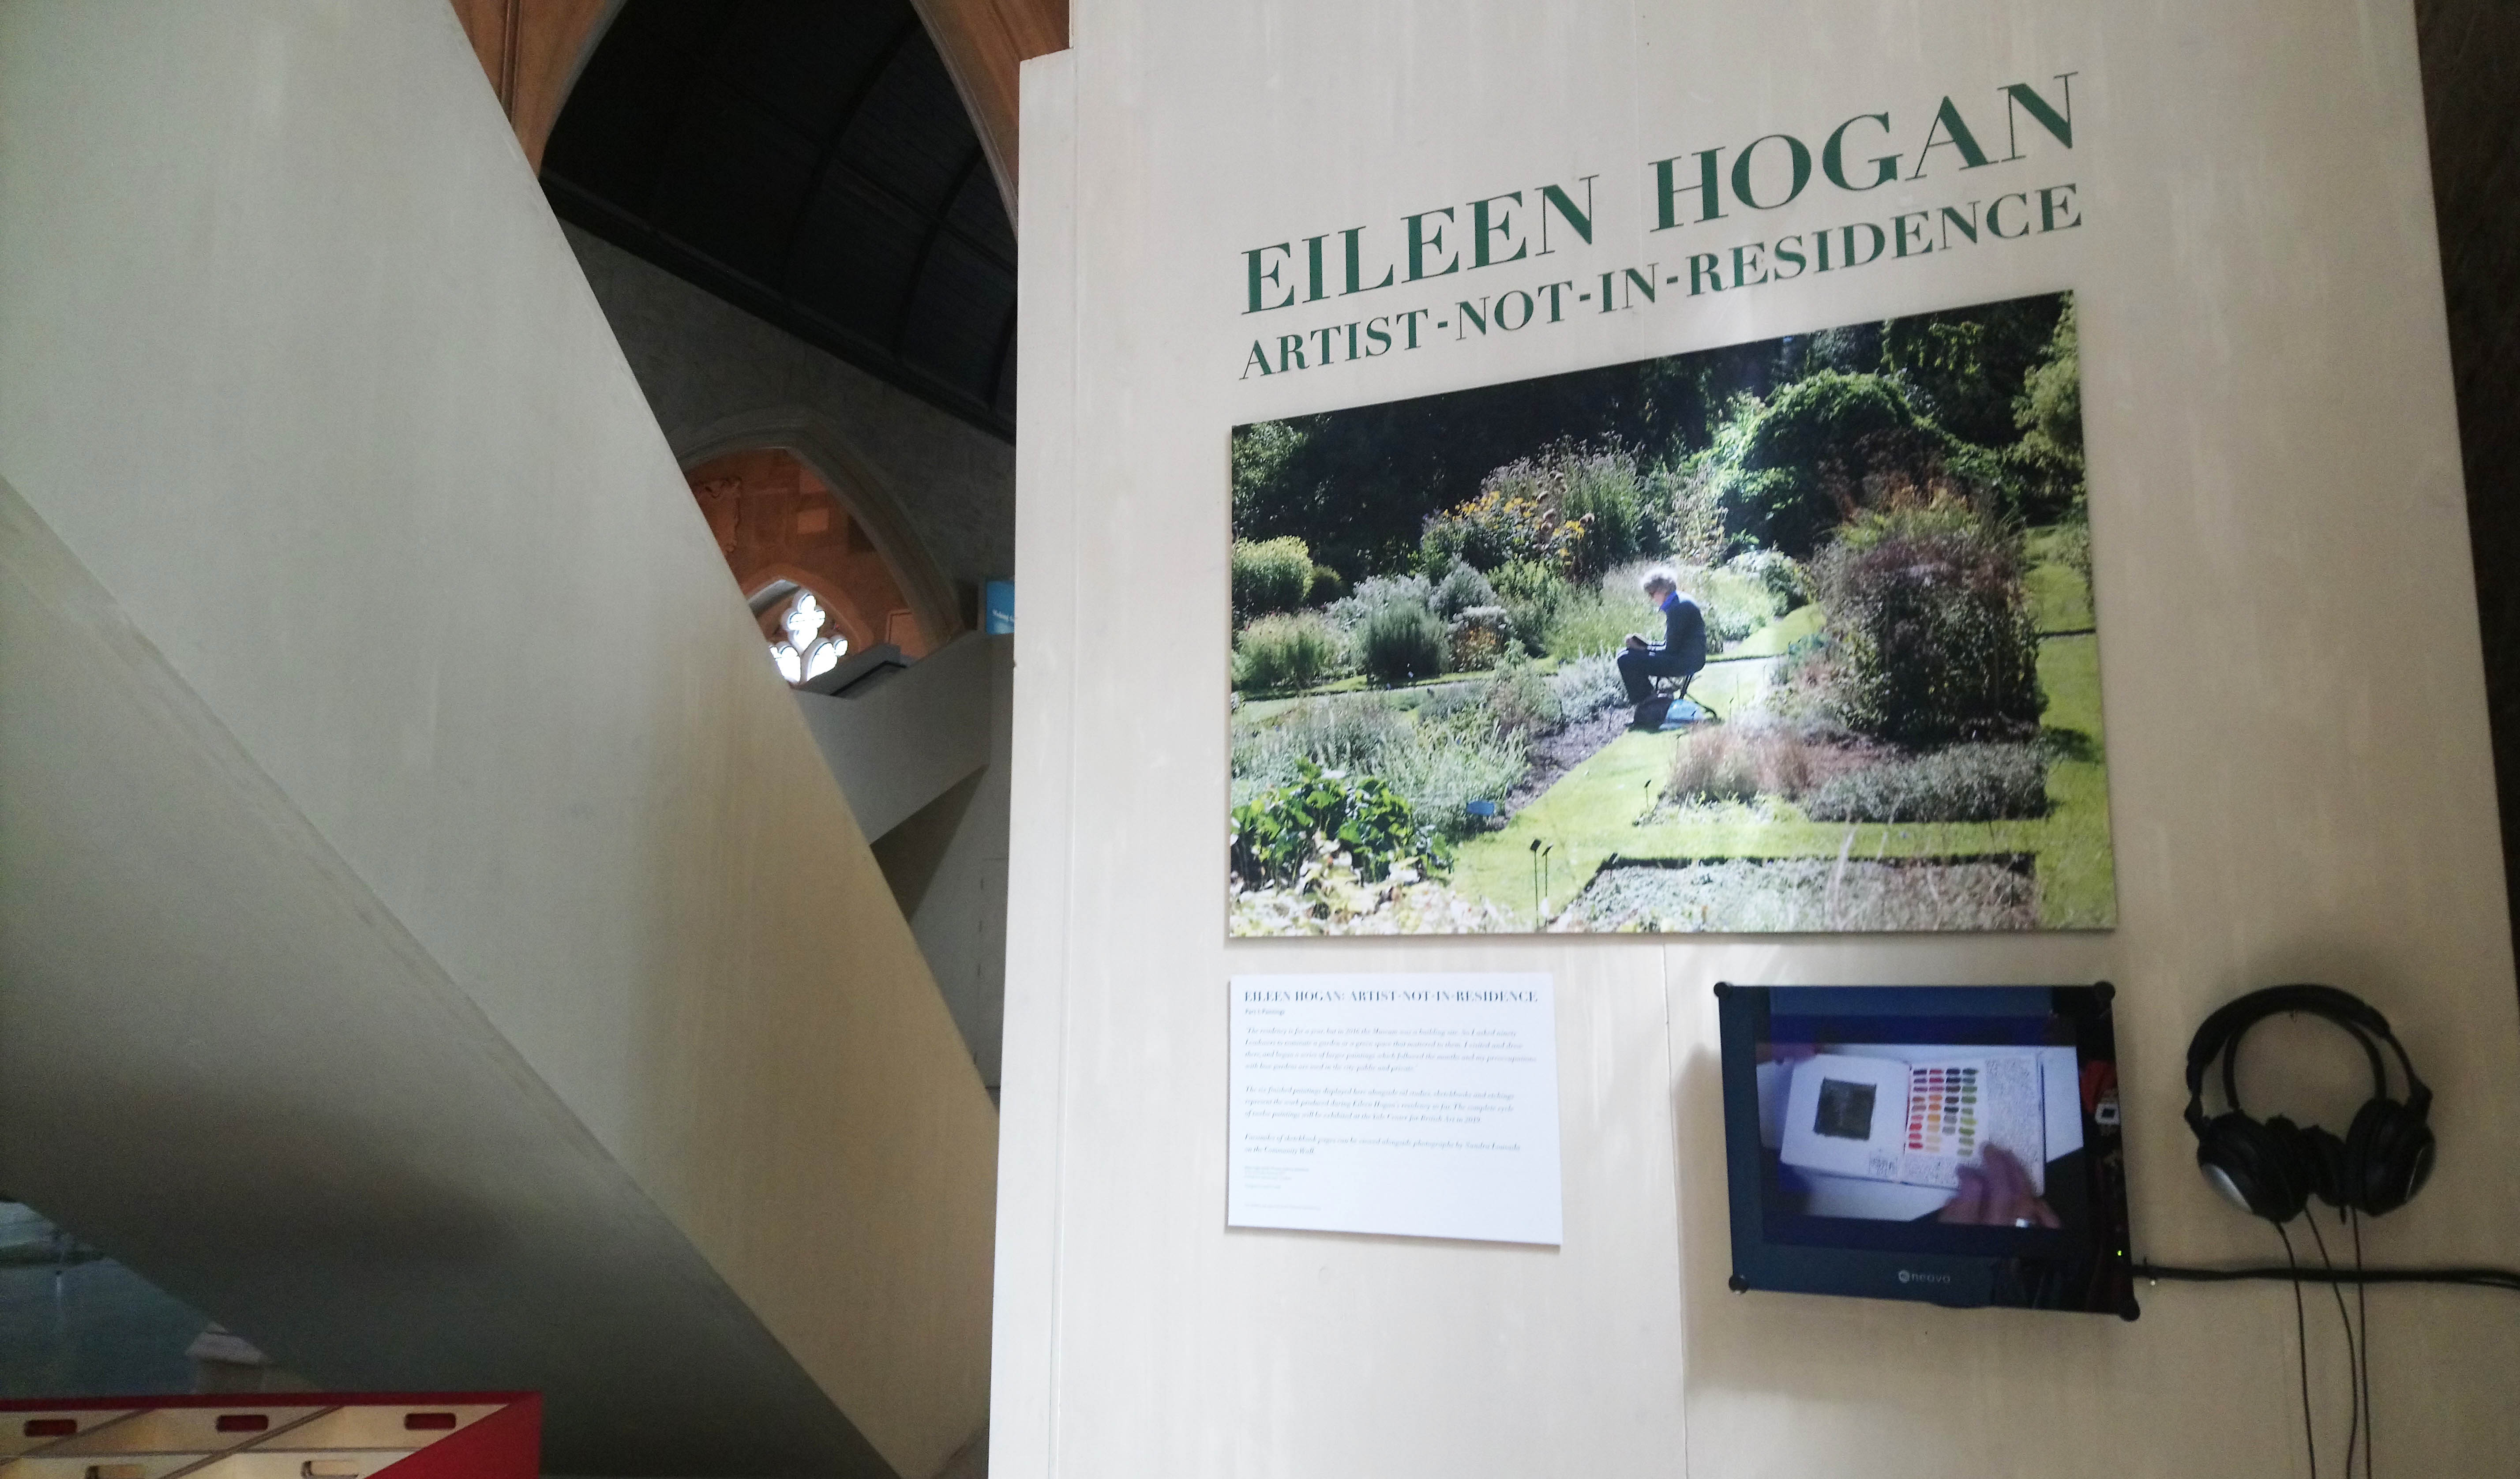 Alaluusua Hogan Garden M sign